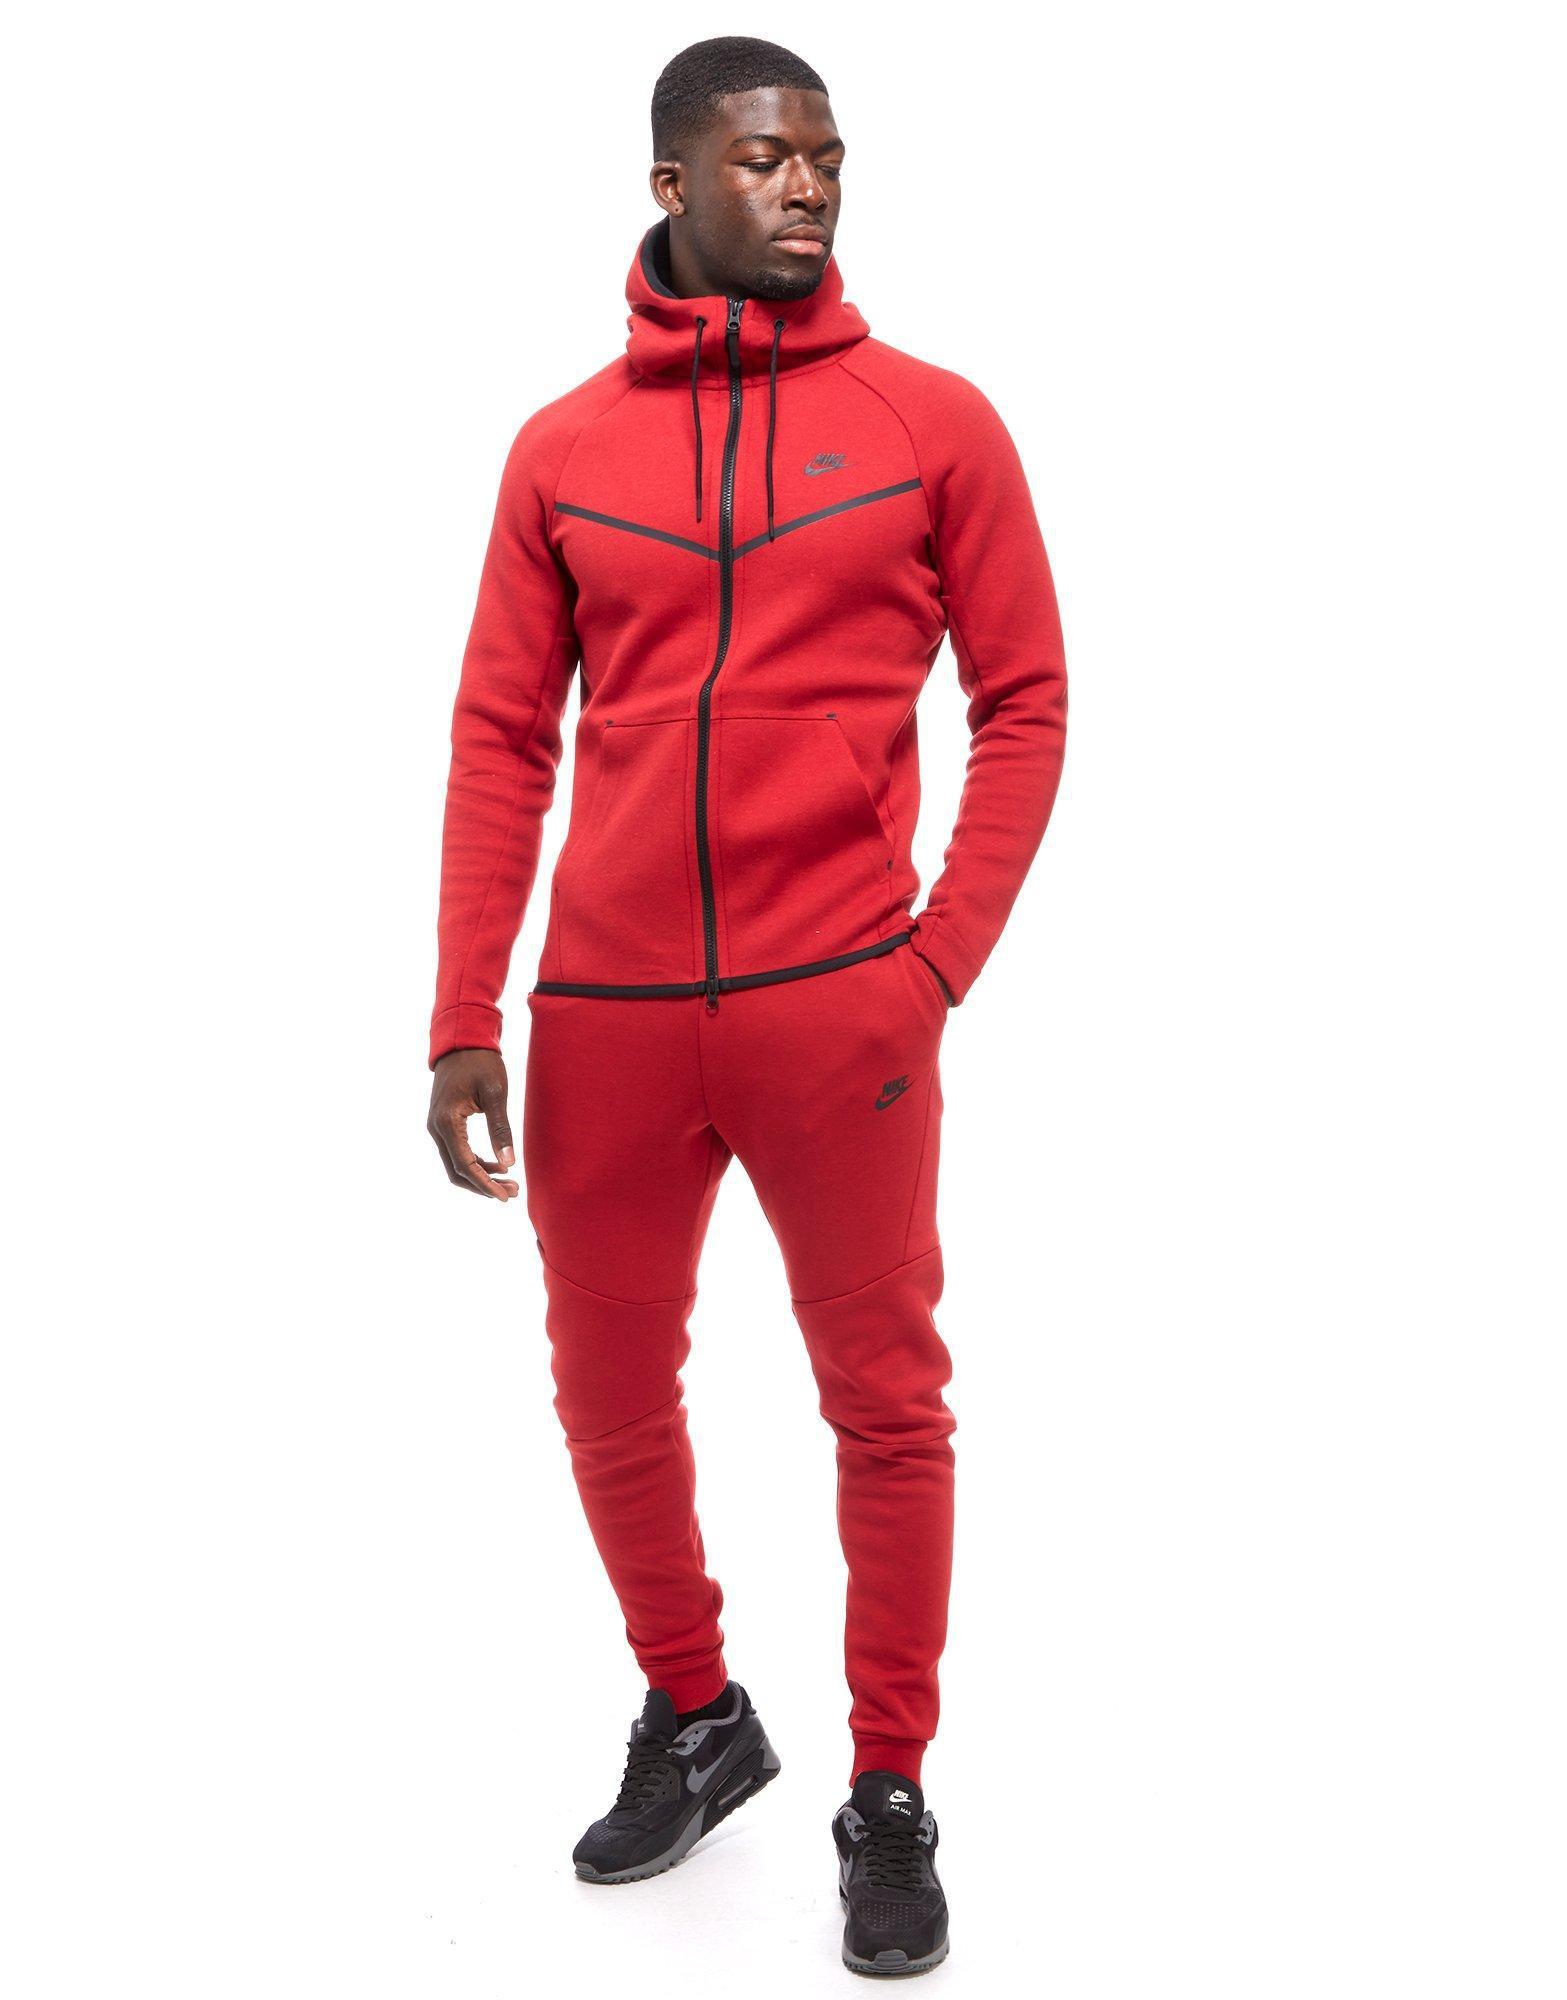 Red Nike Tech Fleece Tracksuit Off 61 Www Ncccc Gov Eg